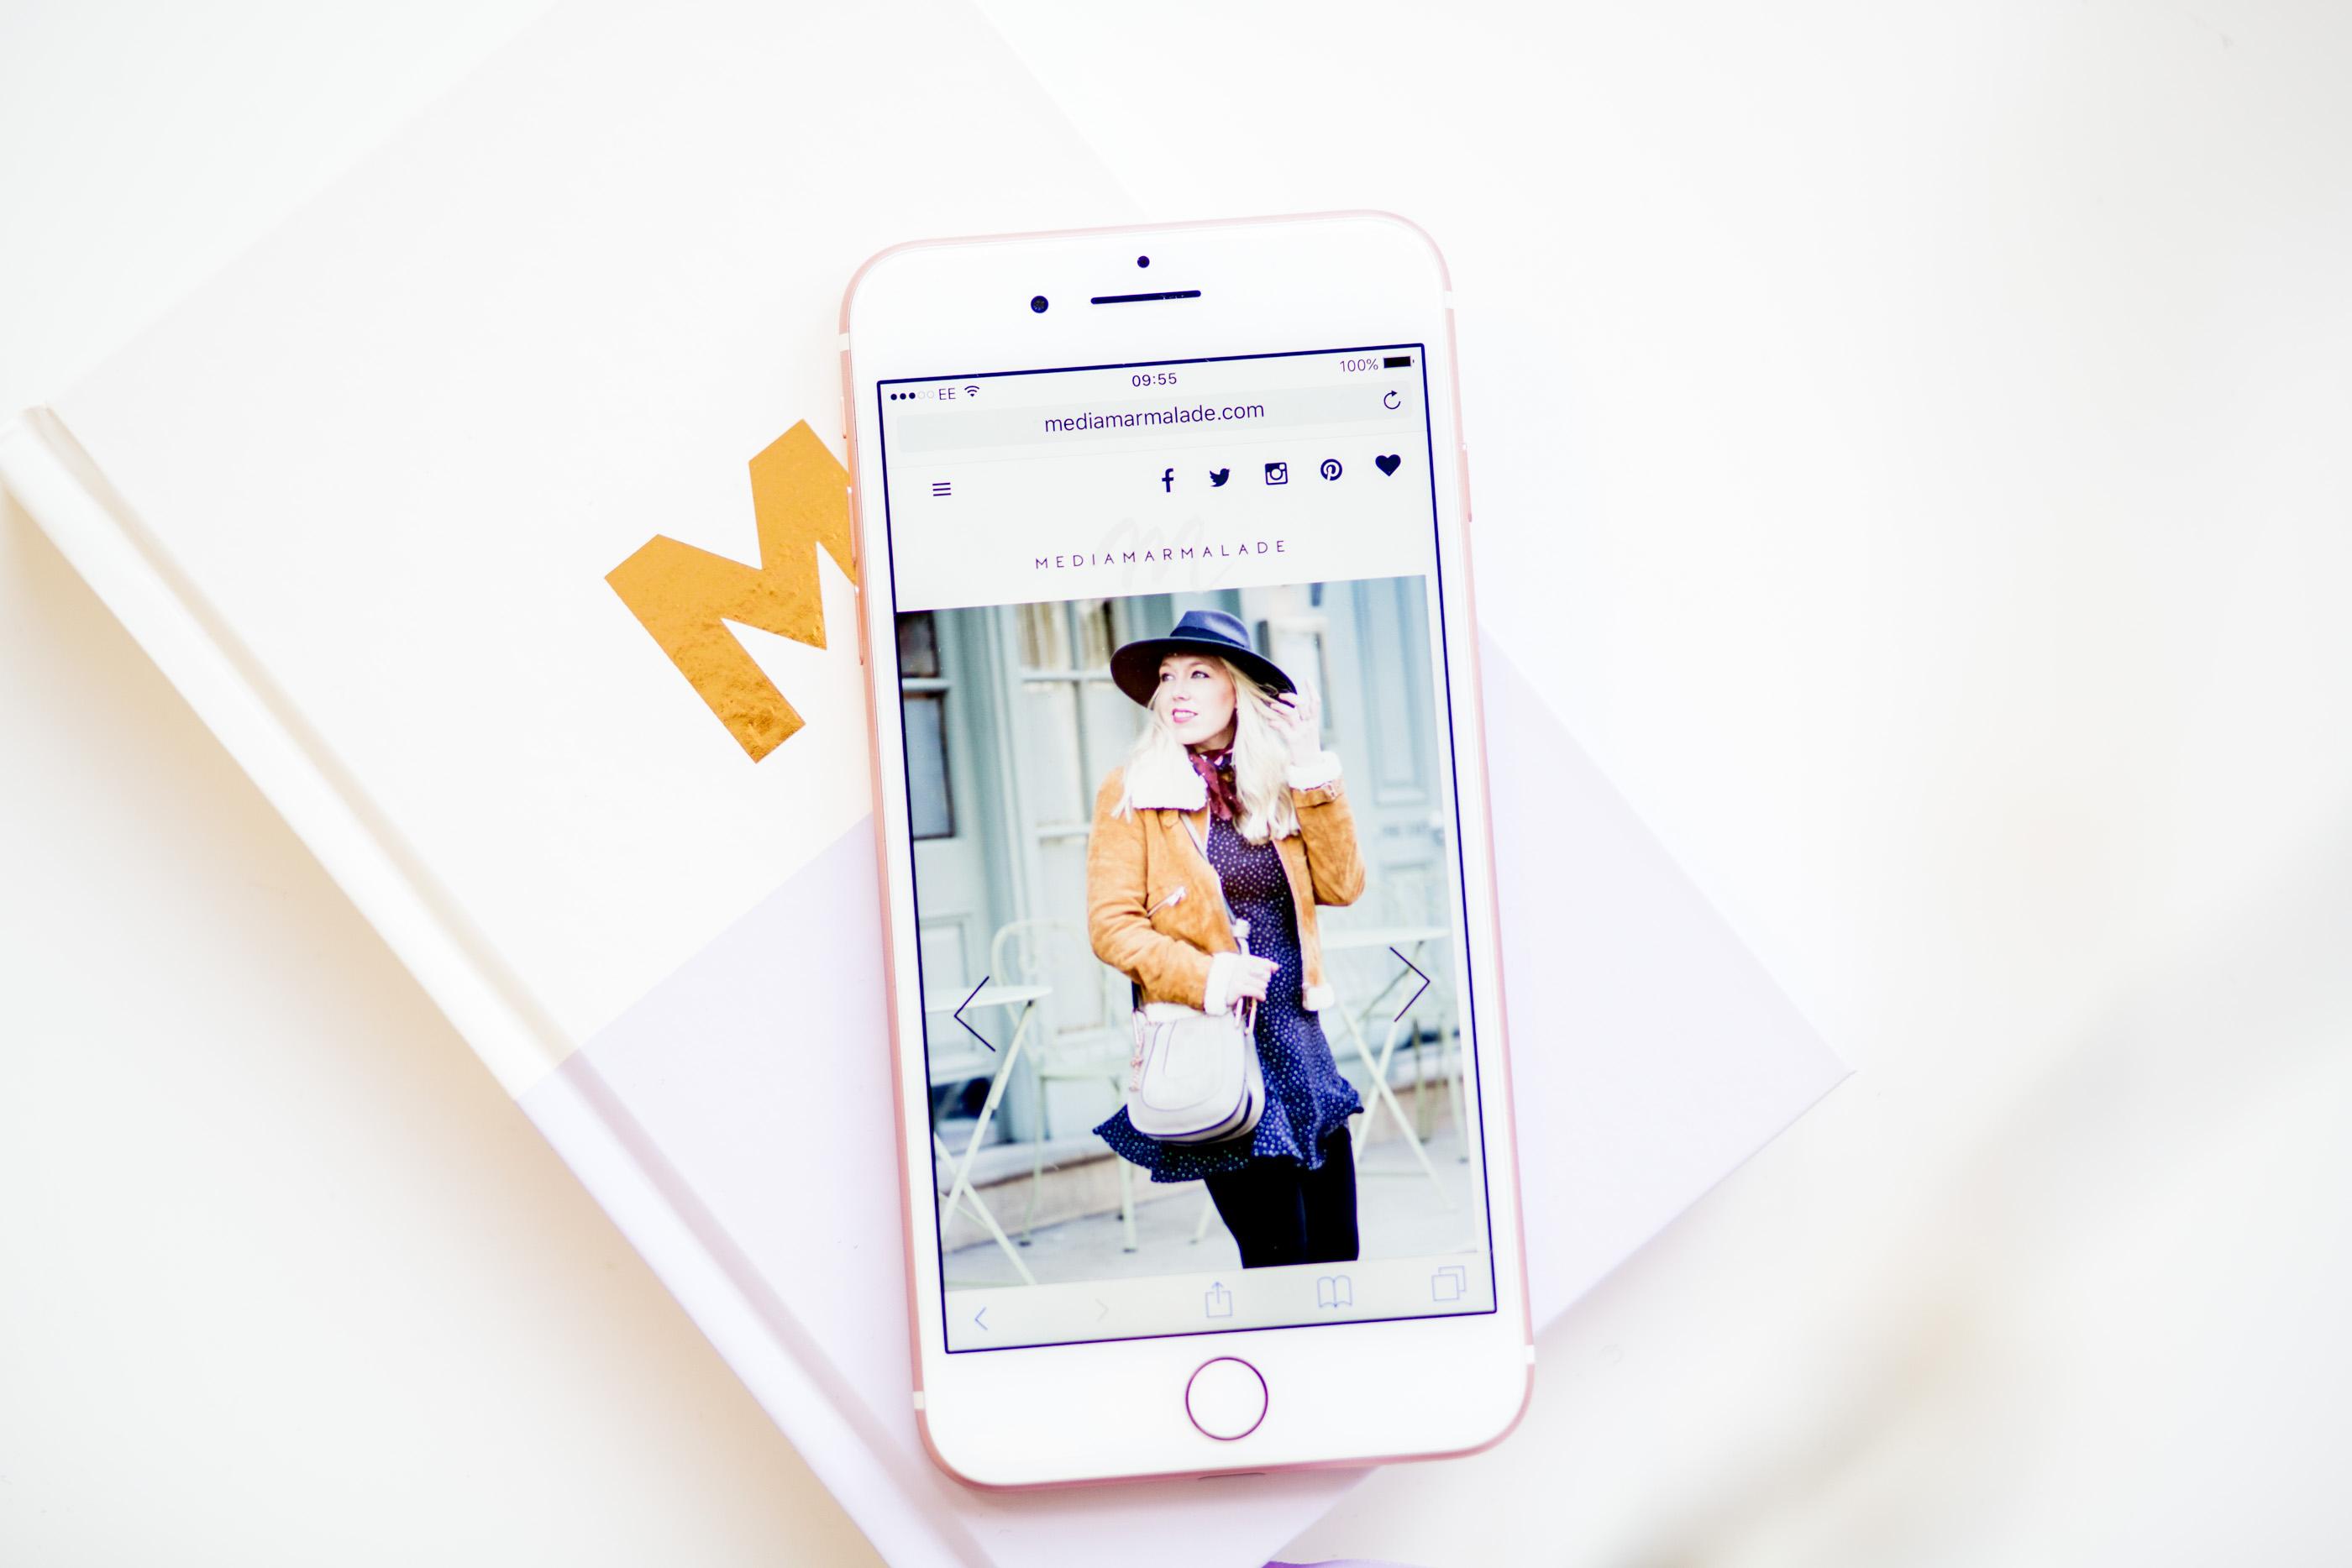 mediamarmalade_relaunch-243